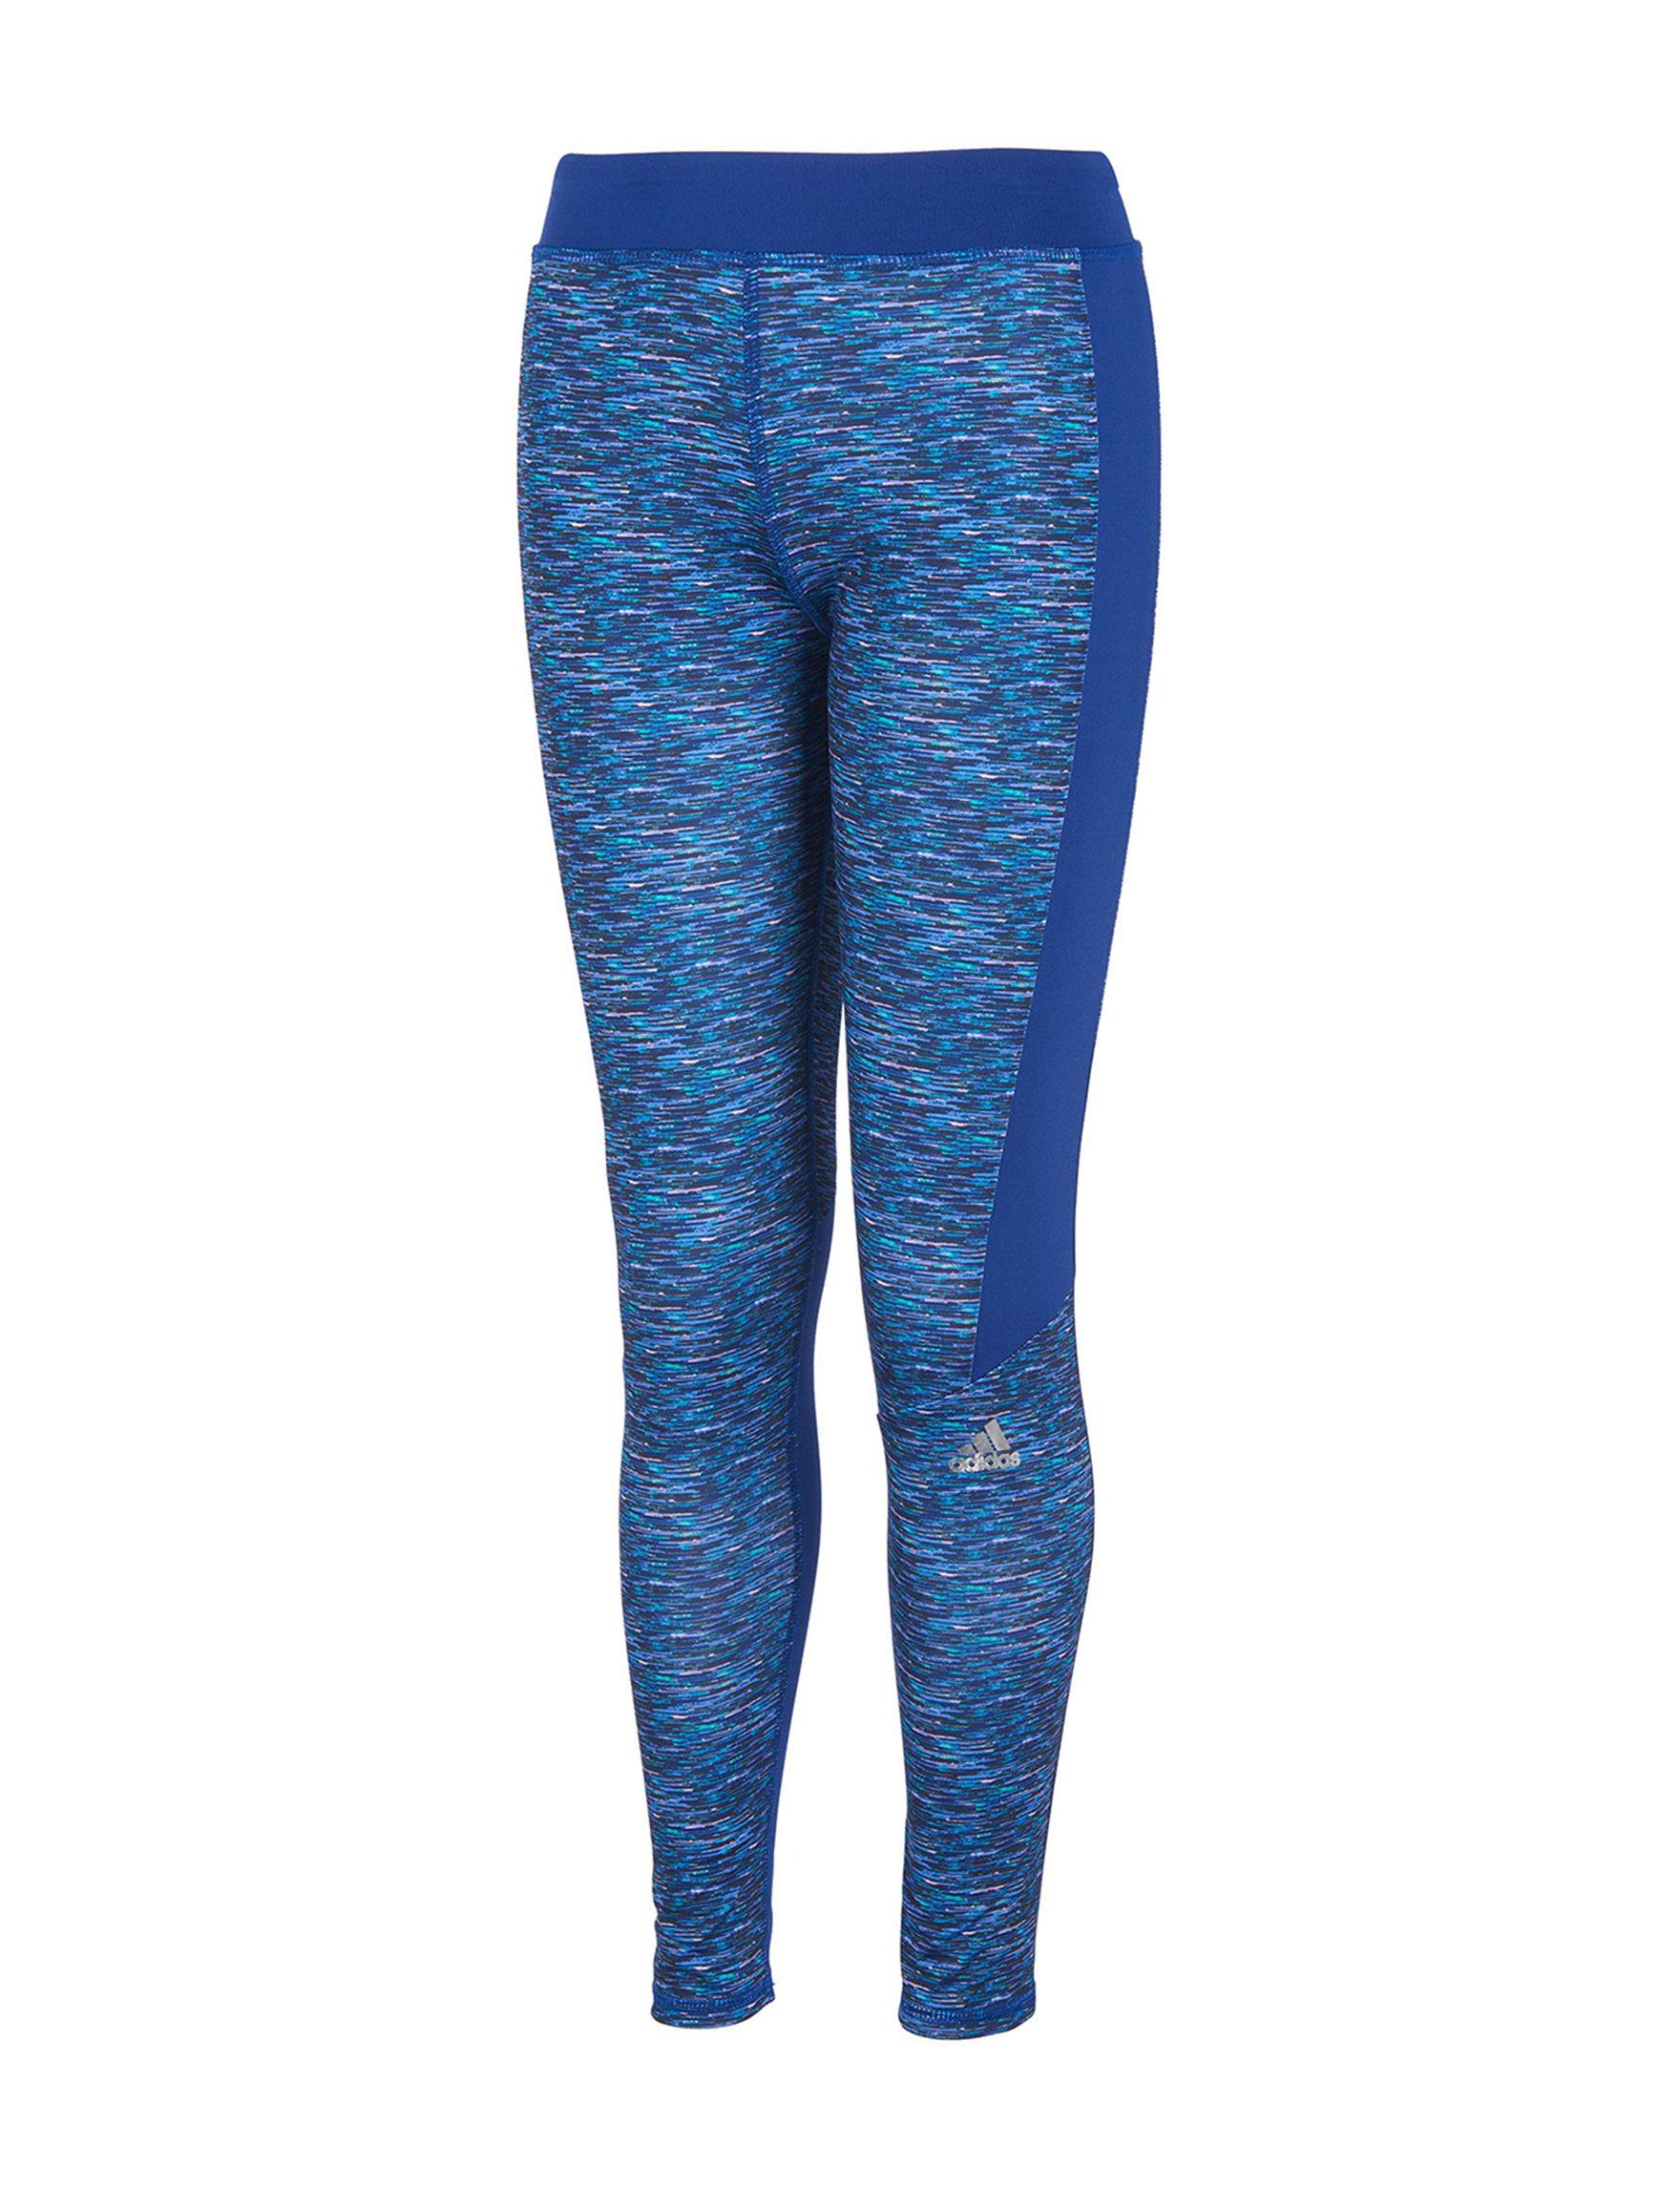 Adidas Blue Multi Leggings